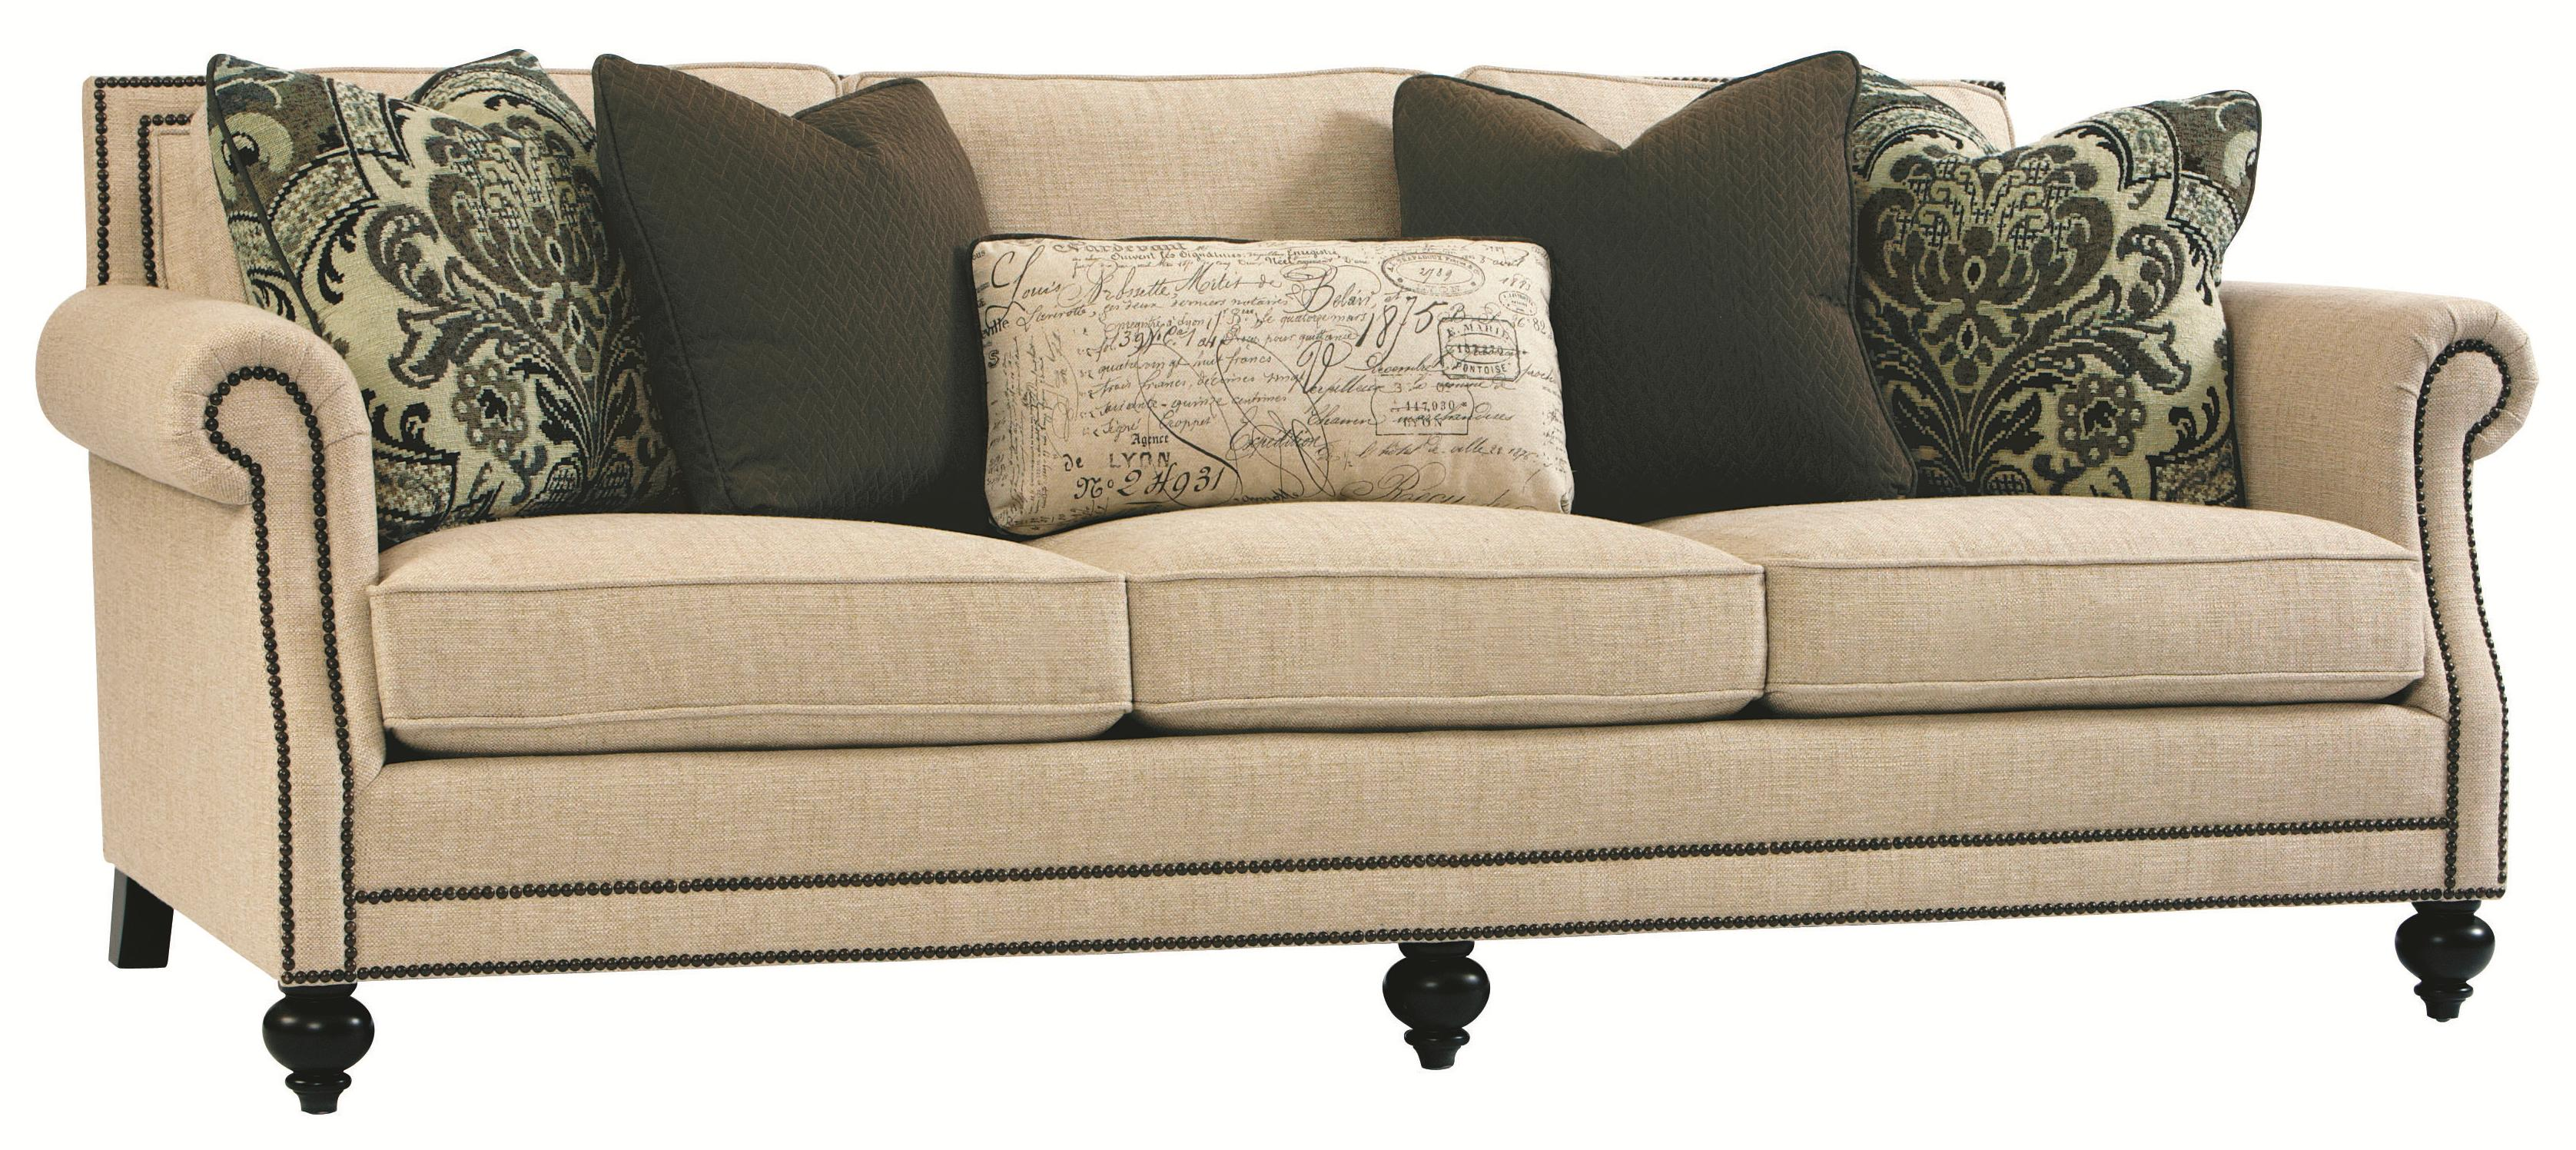 Bernhardt brae elegant and traditional living room sofa for Elegant traditional living room furniture